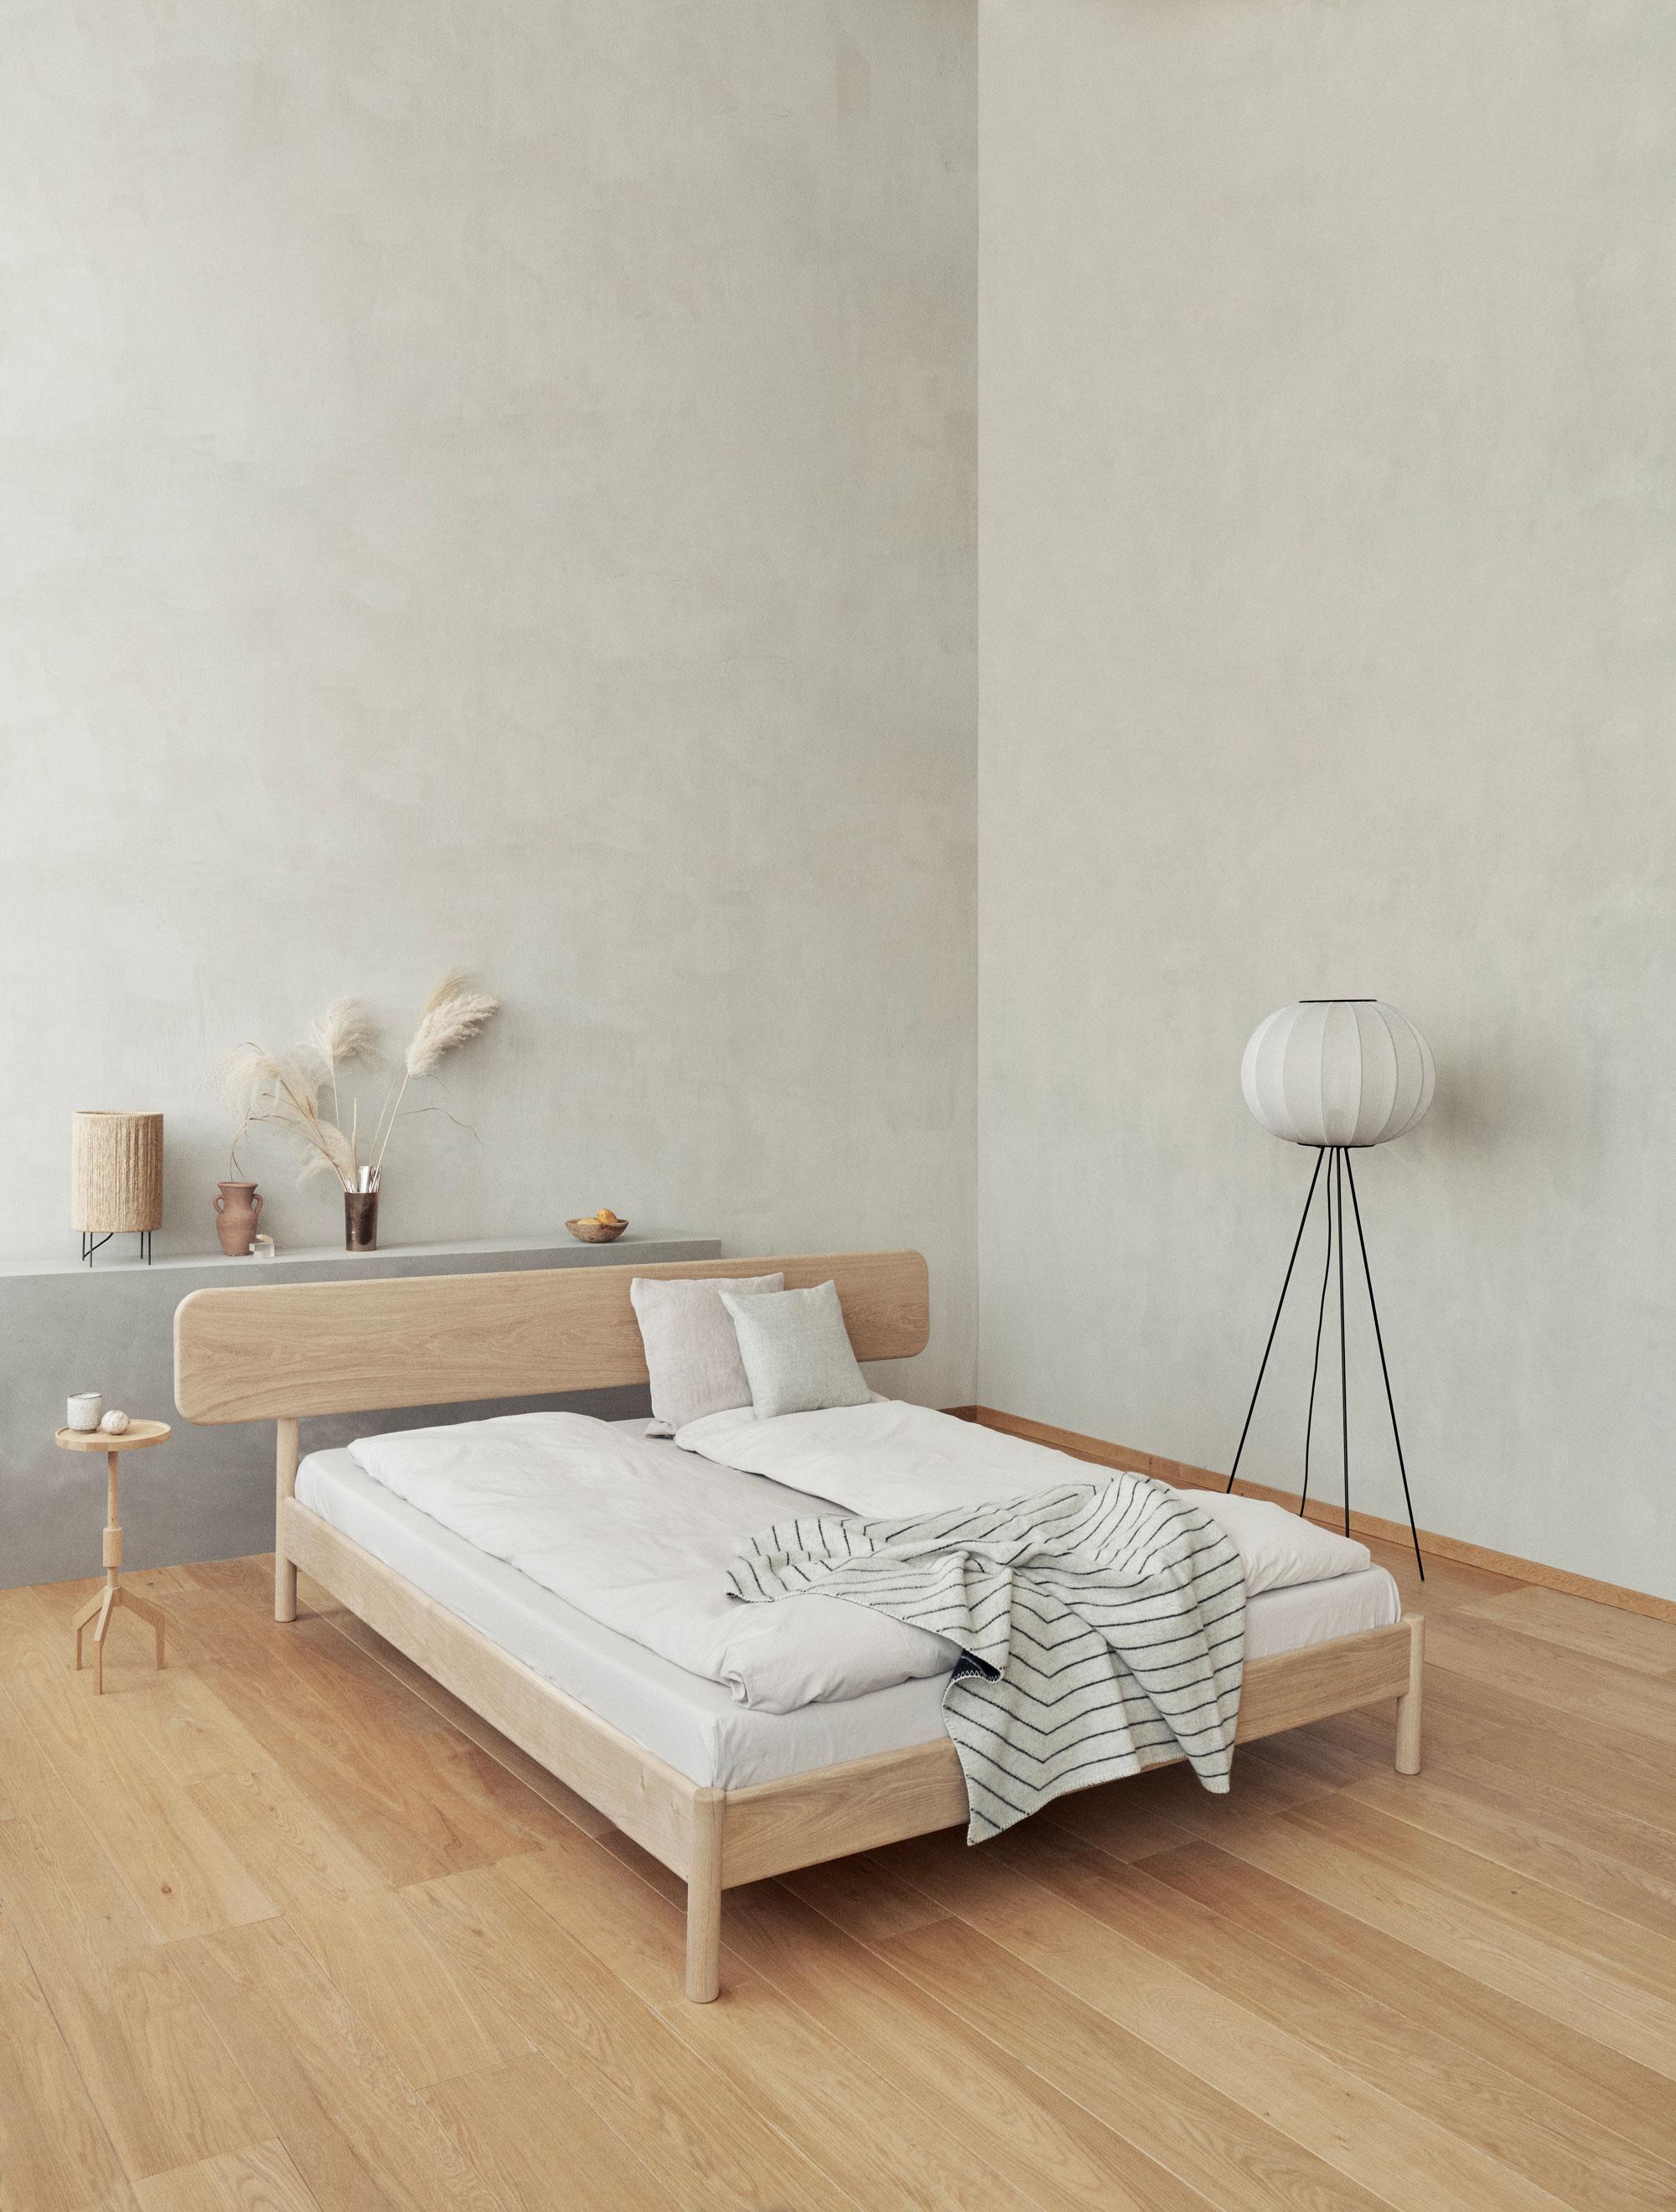 01---ALKEN-BED-AT-THE-LAB---RE-BEDS---DESIGN-BY-OLIVER-&-LUKAS-WEISSKROGH.jpg